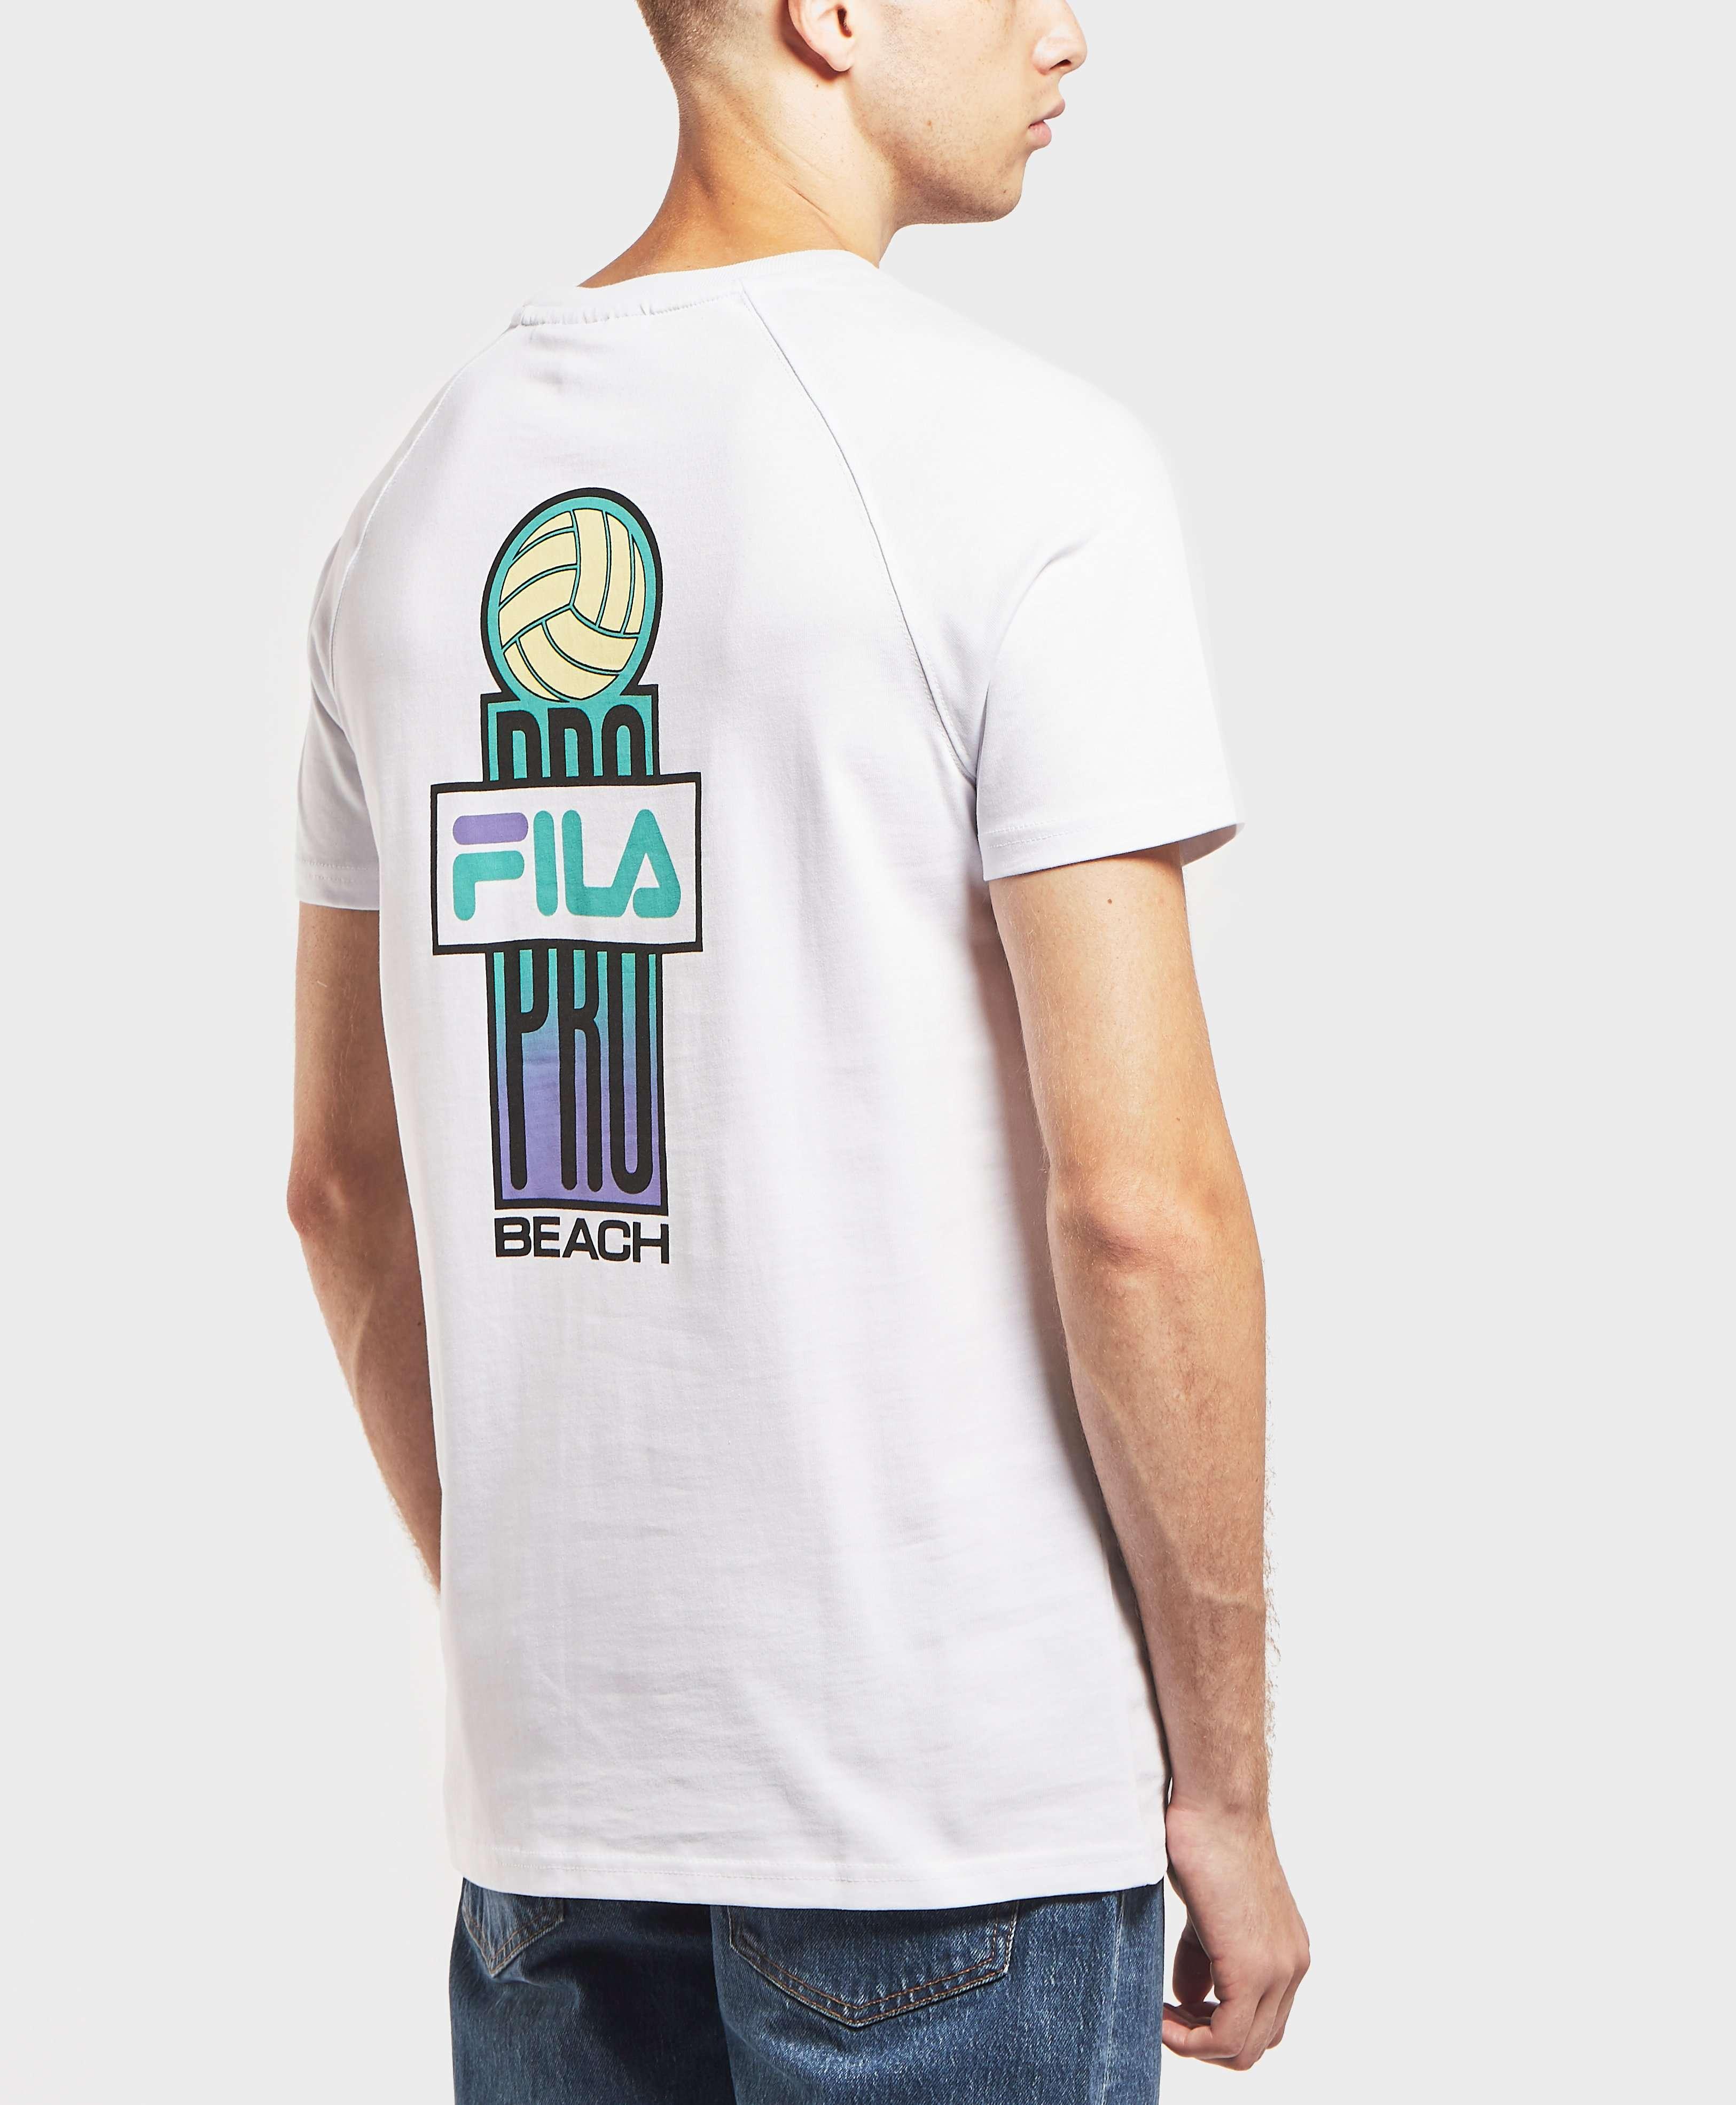 Fila Pro Beach Short Sleeve T-Shirt - Exclusive